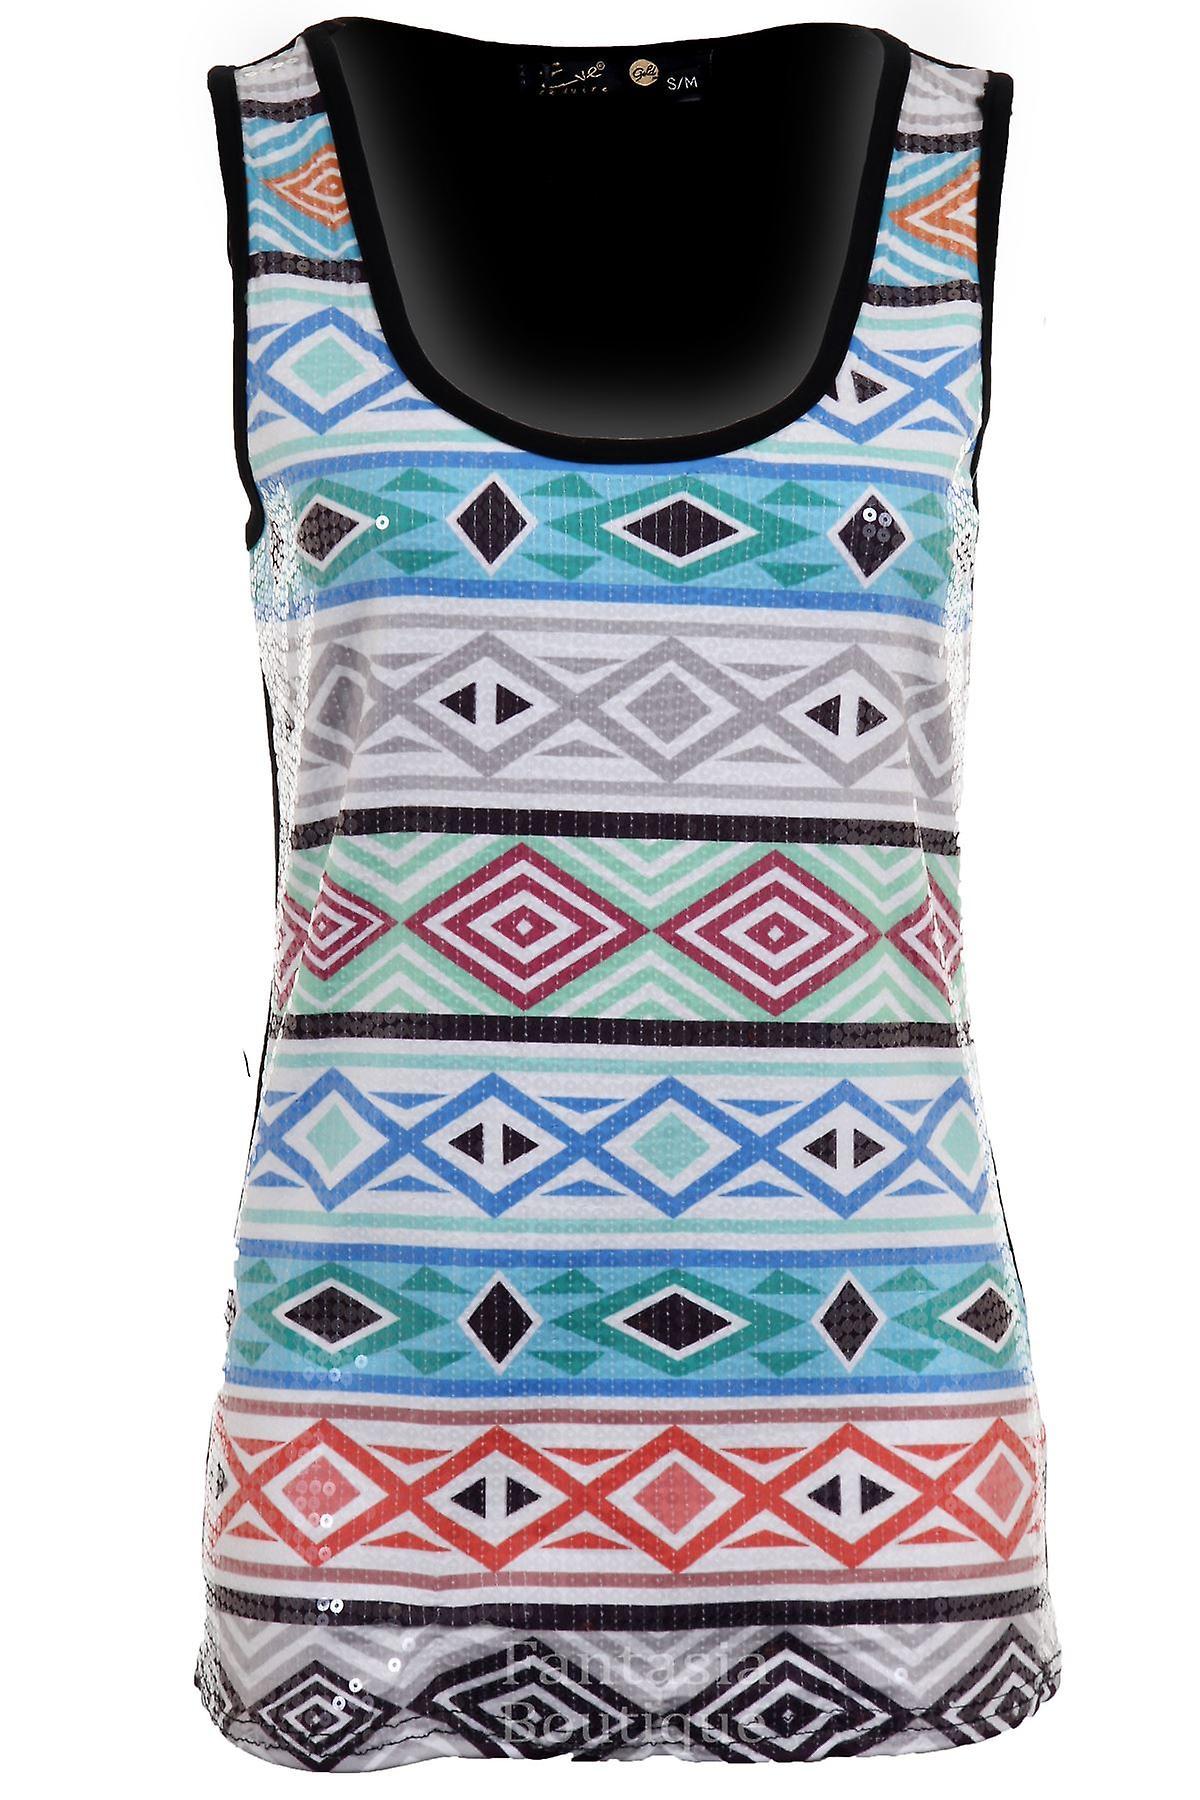 Ladies Sequin Diamond Aztec Multi Coloured Abstract Racer Women's Plain Back Top Vest